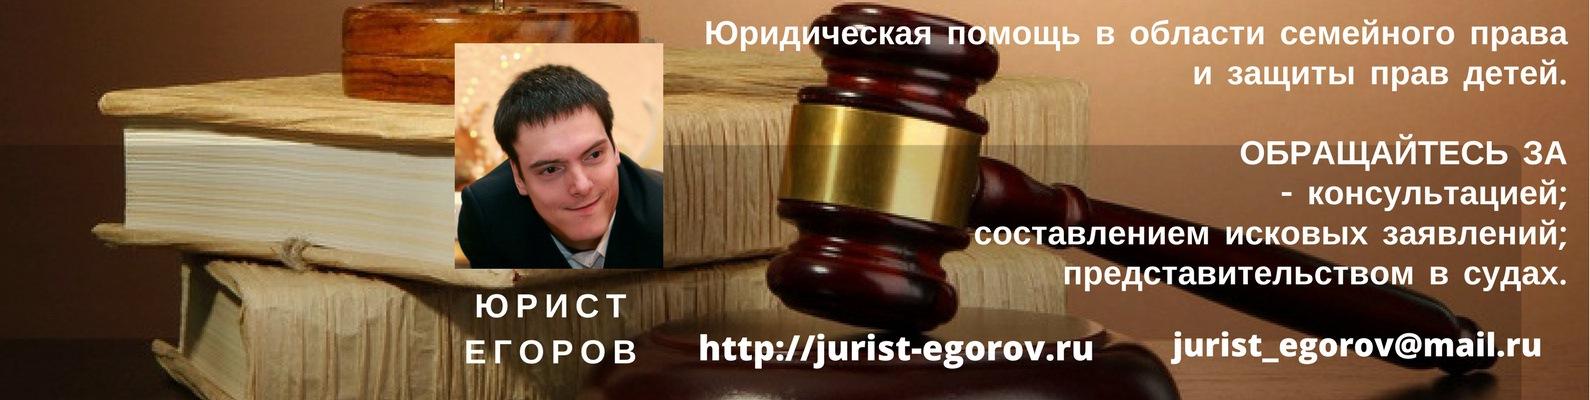 Юрист в области семейного права